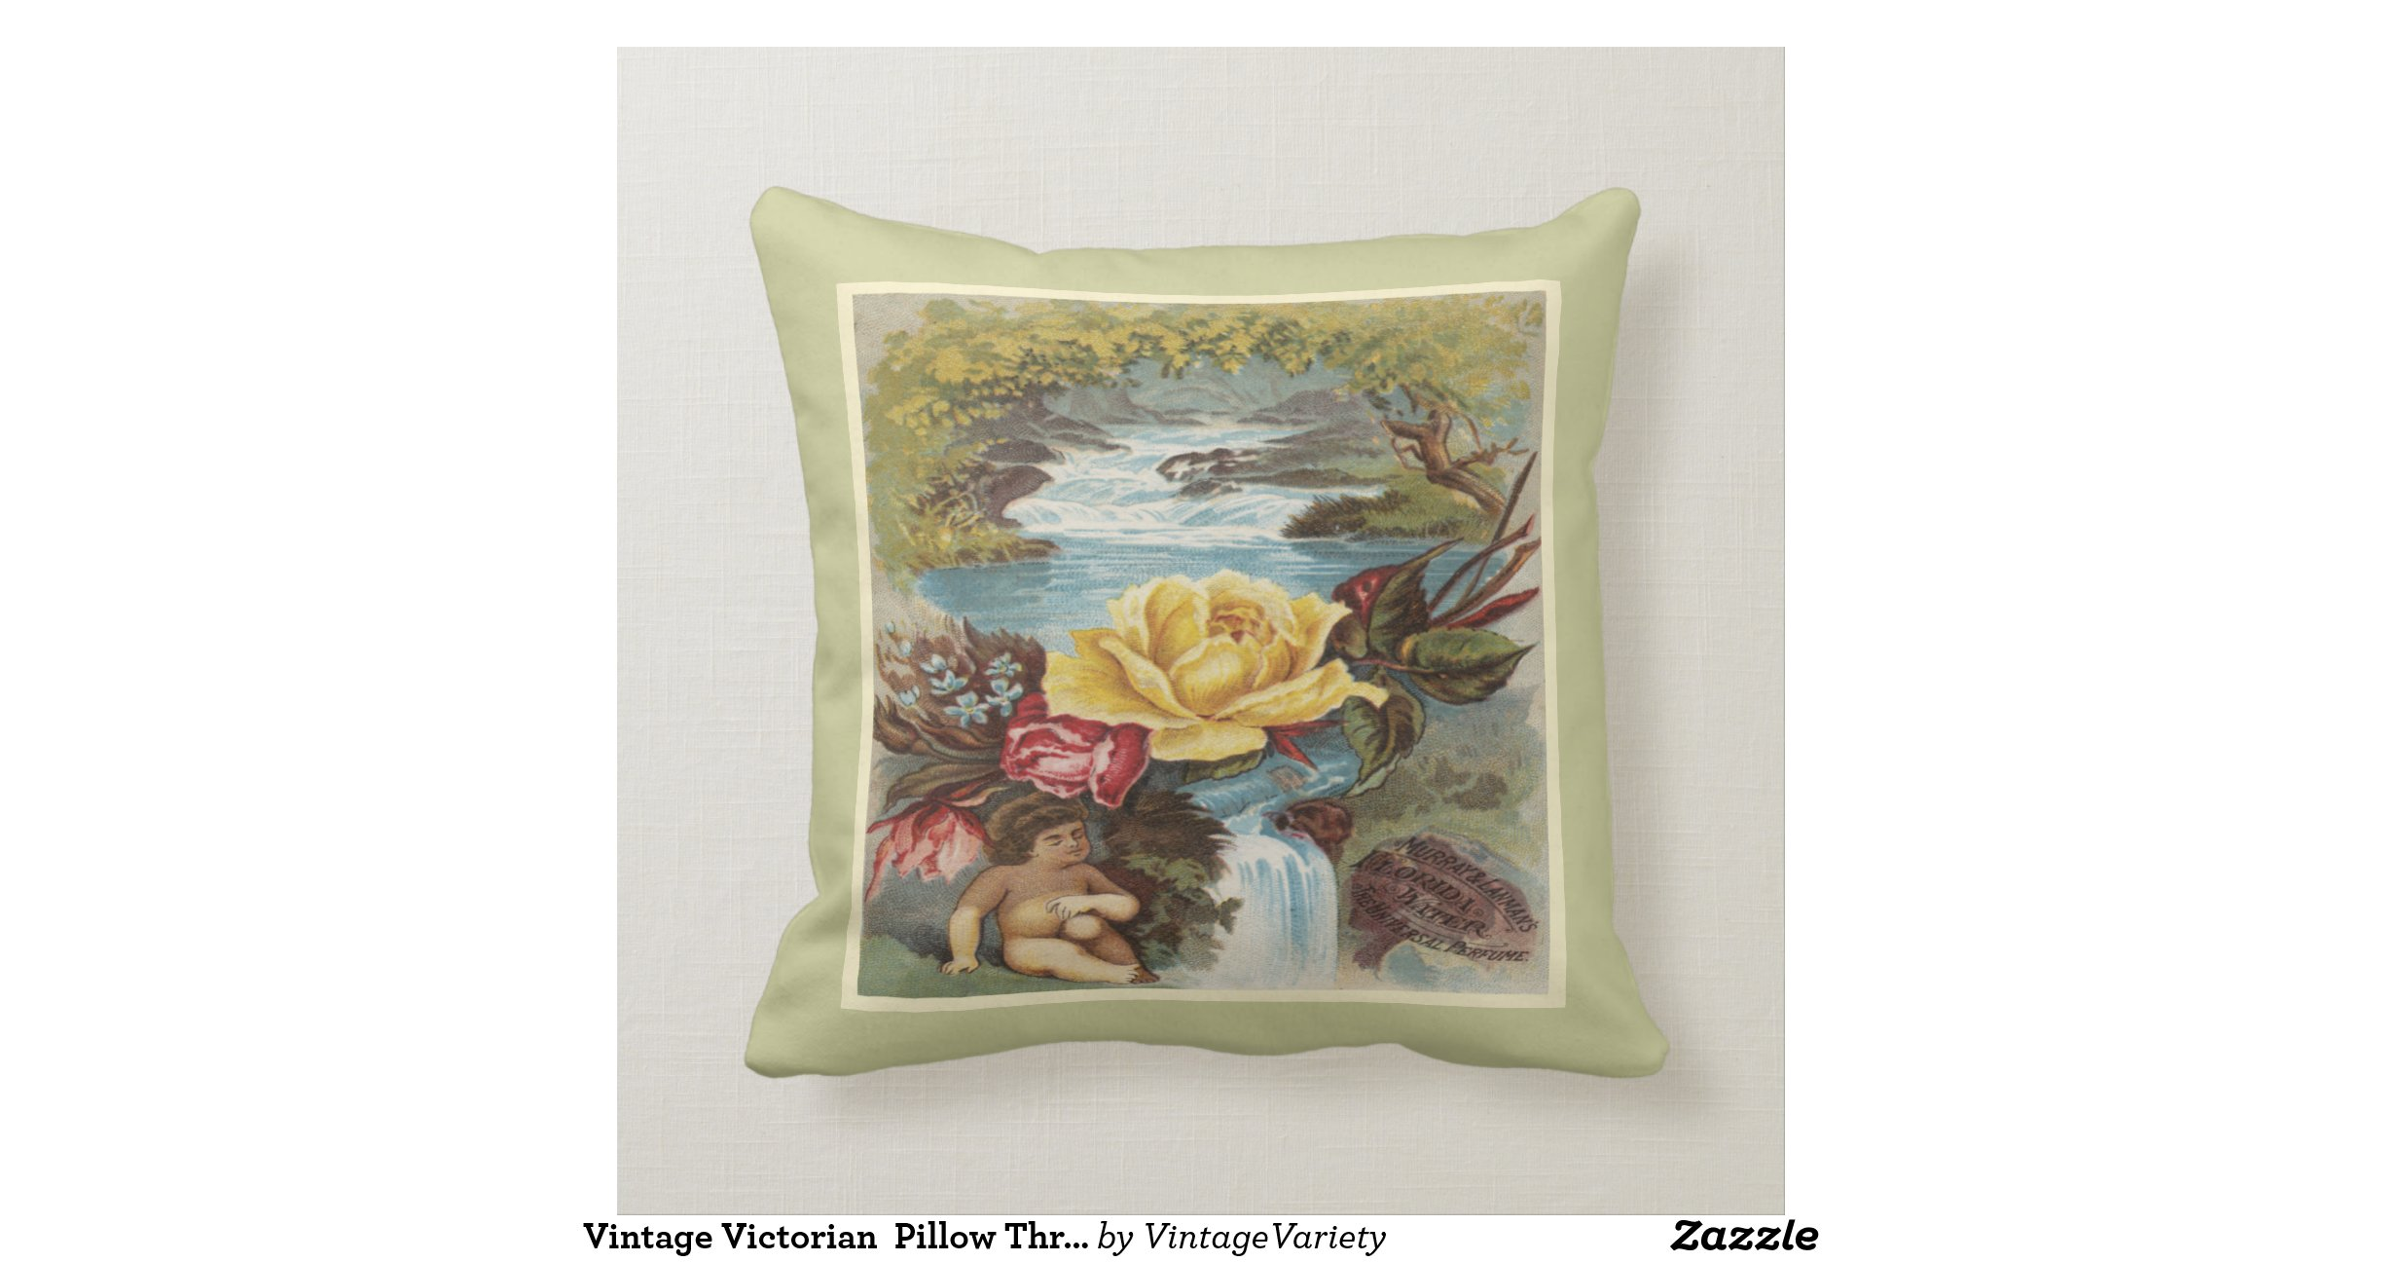 Vintage Victorian Pillows : Vintage Victorian Pillow Throw Zazzle